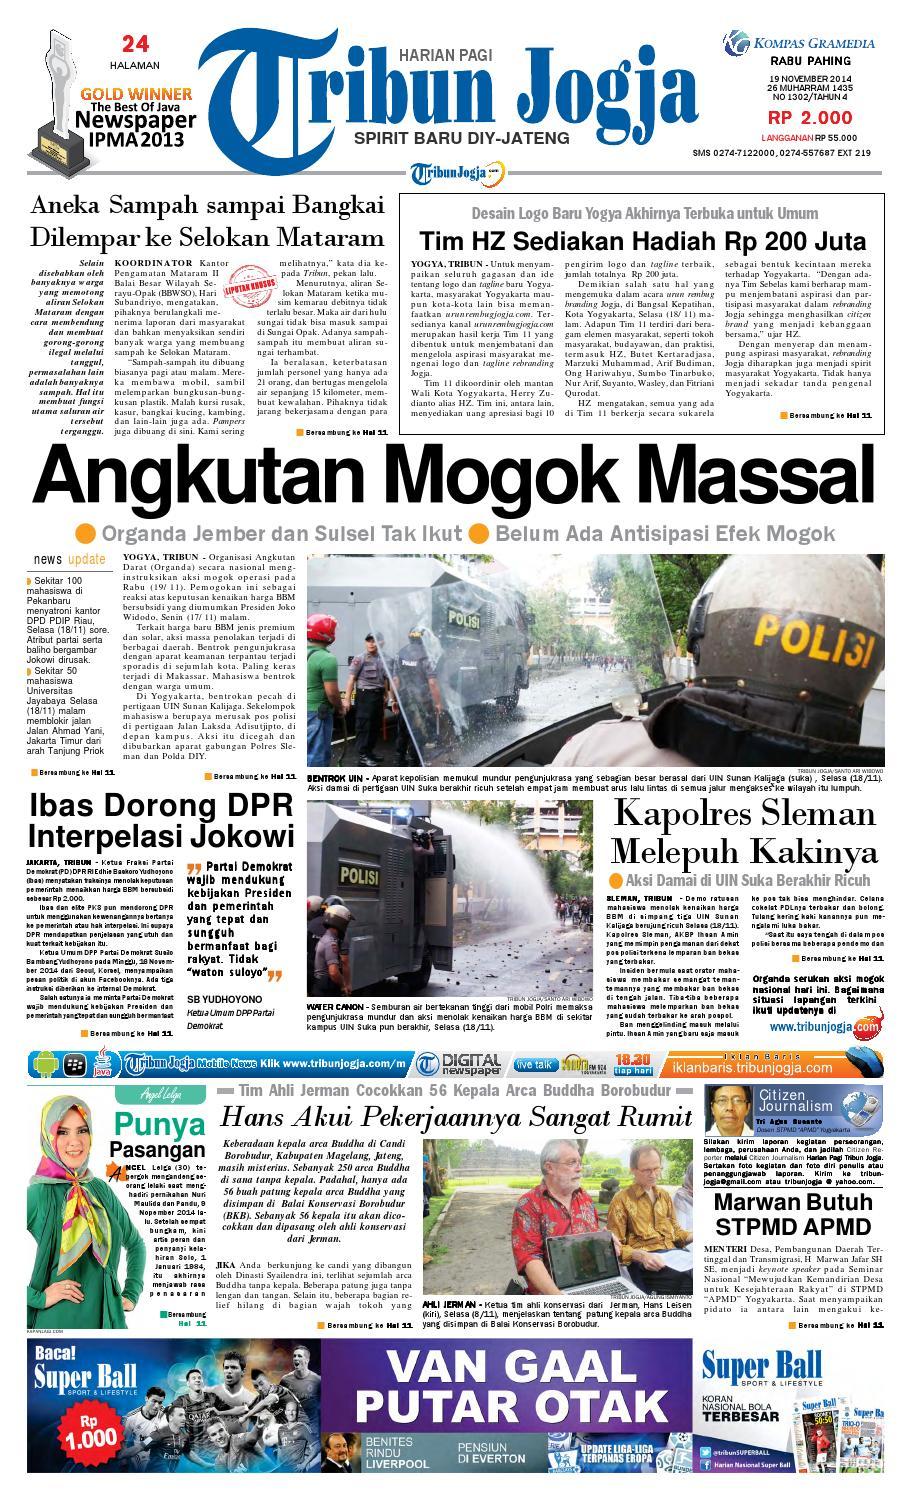 Tribunjogja 19 11 2014 By Tribun Jogja Issuu Tcash Vaganza 36 Produk Ukm Bumn Batik Print Motif3